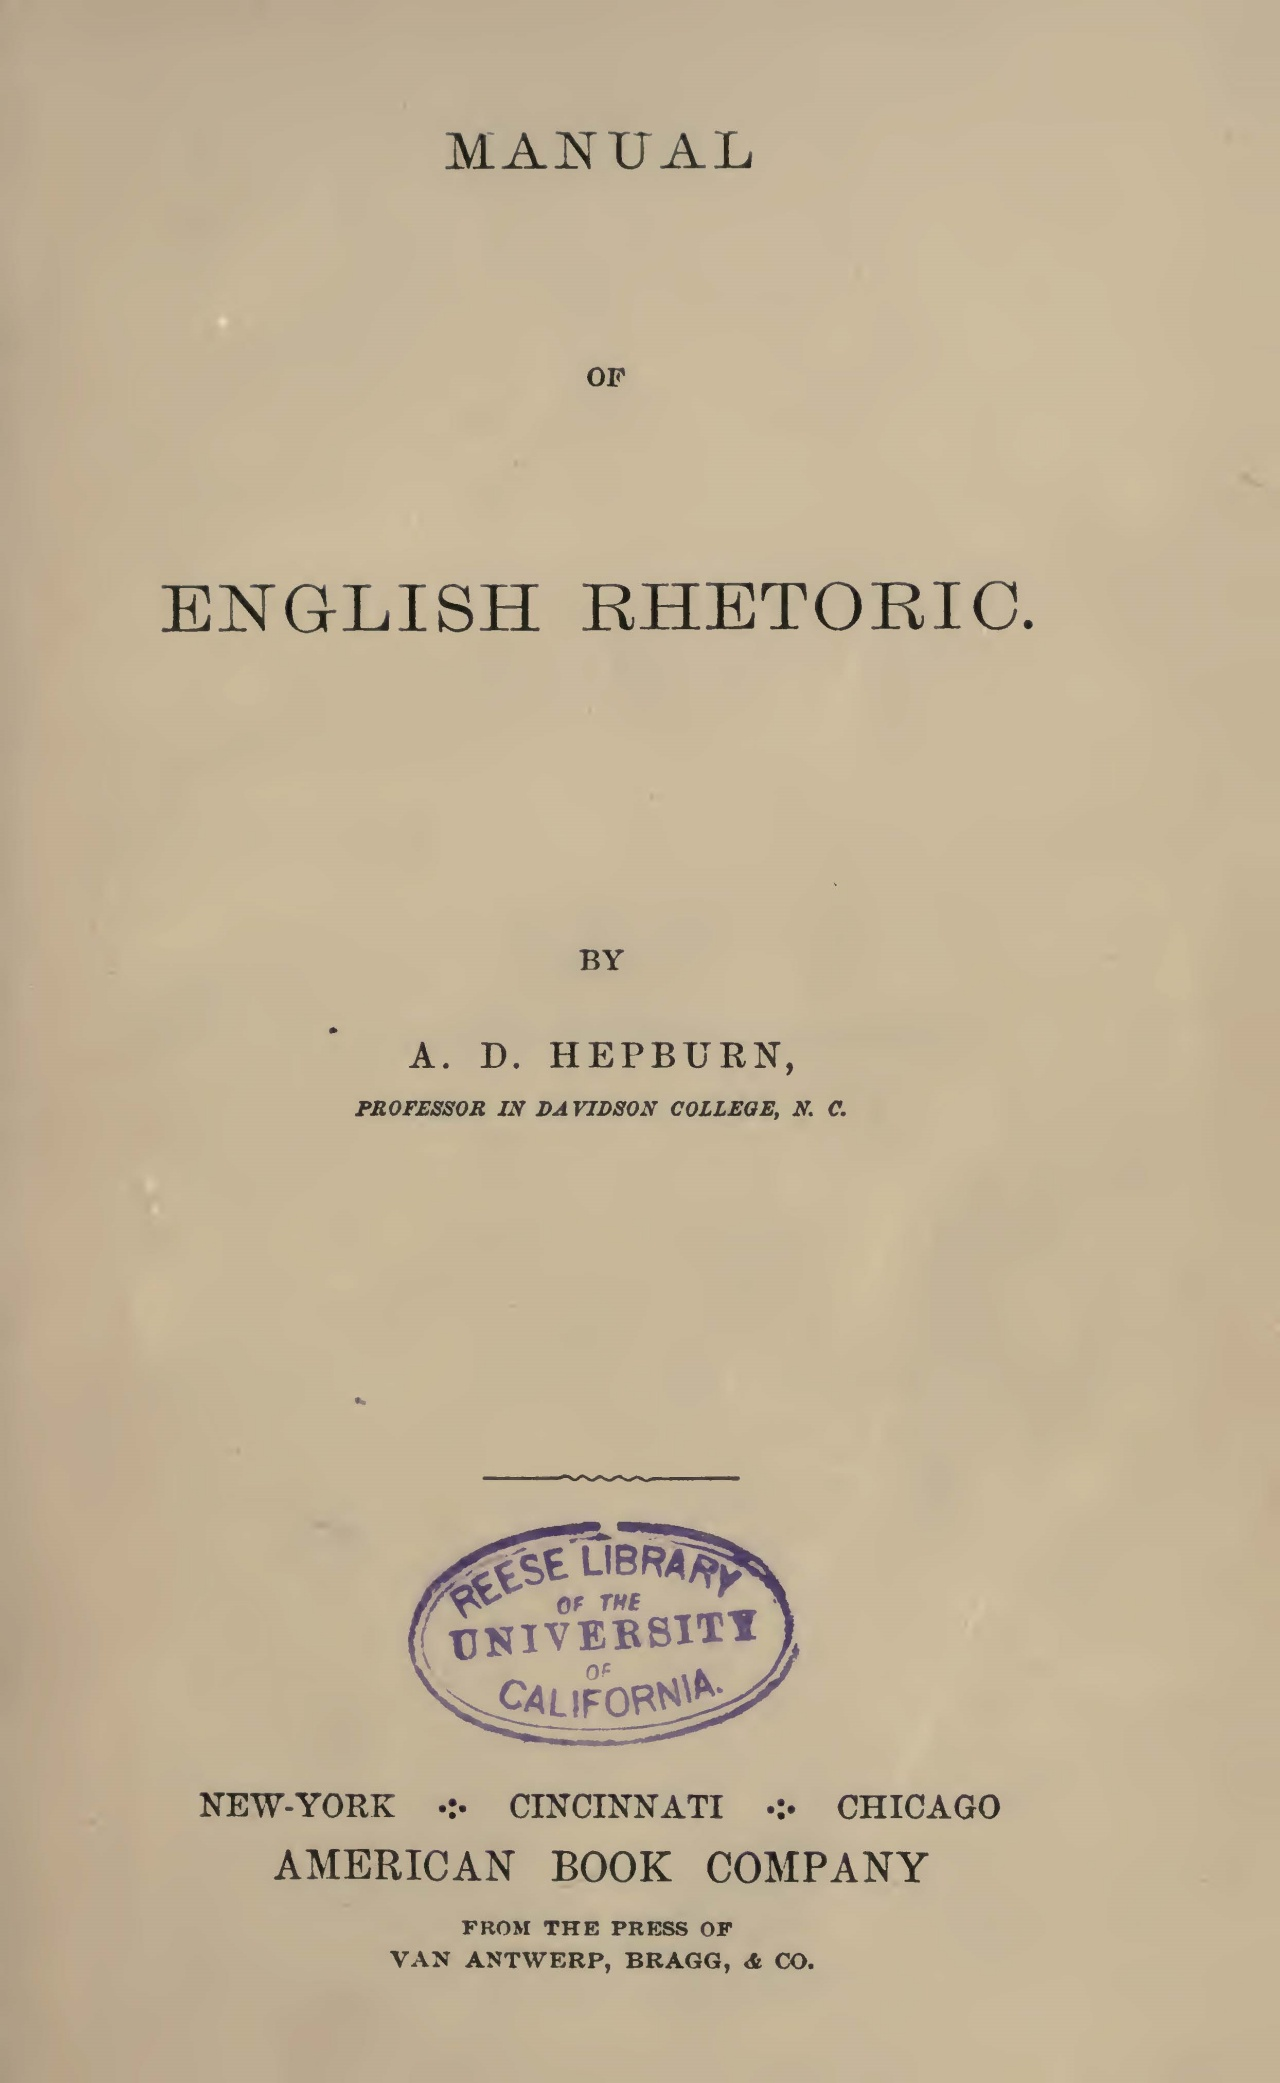 Hepburn, Andrew Dousa, Manual of English Rhetoric Title Page.jpg